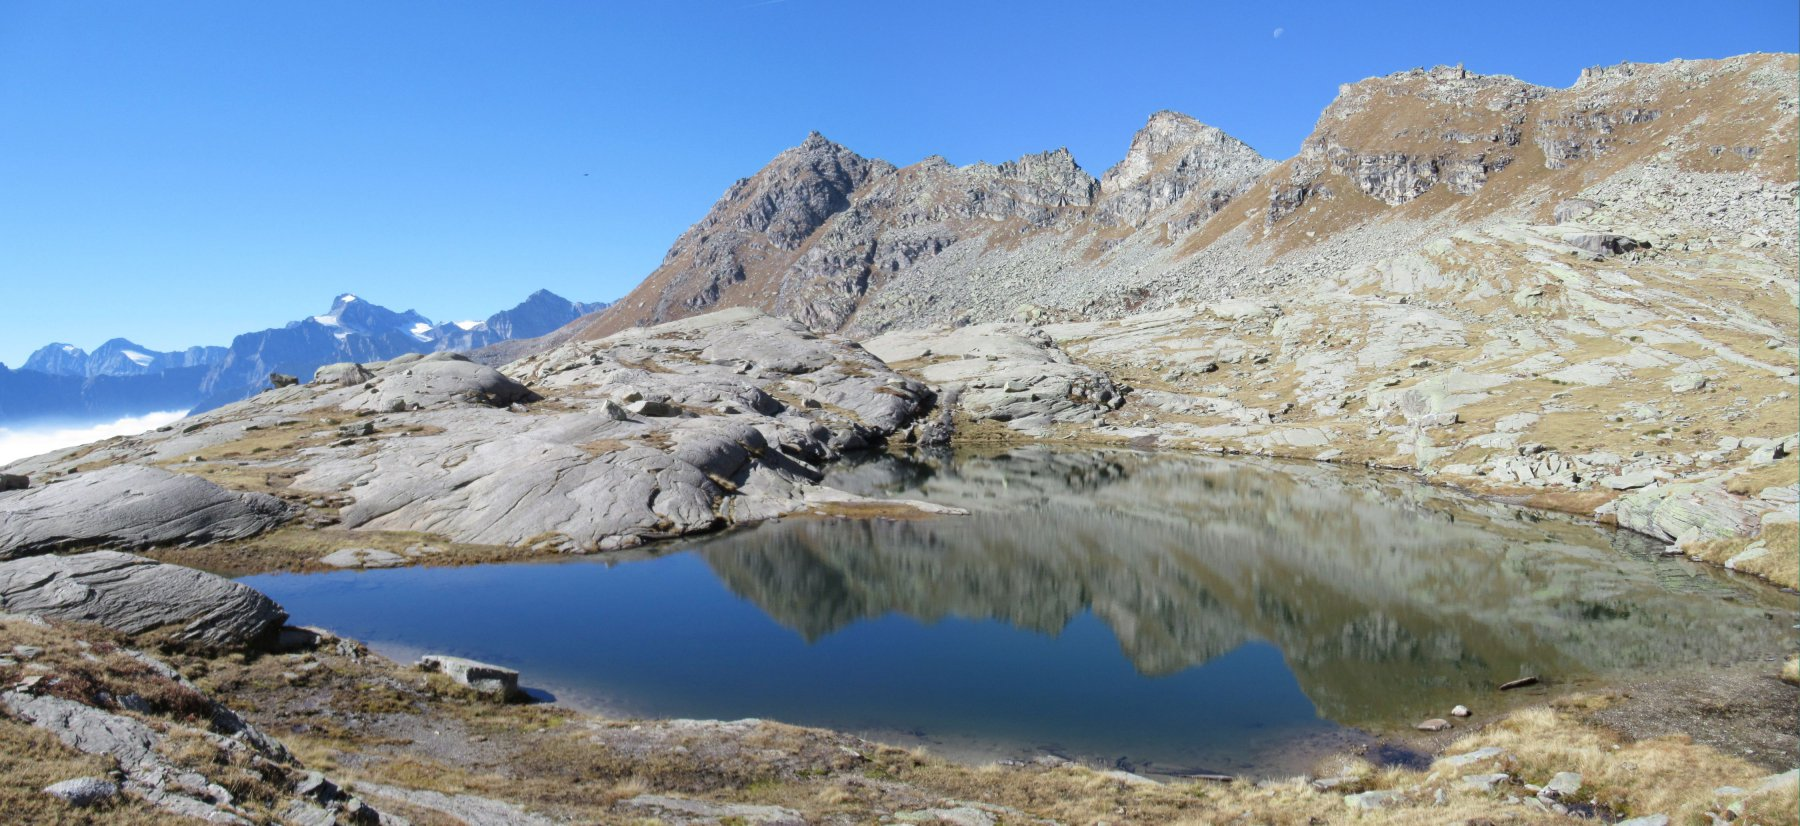 Lago di Vercellina m. 2432